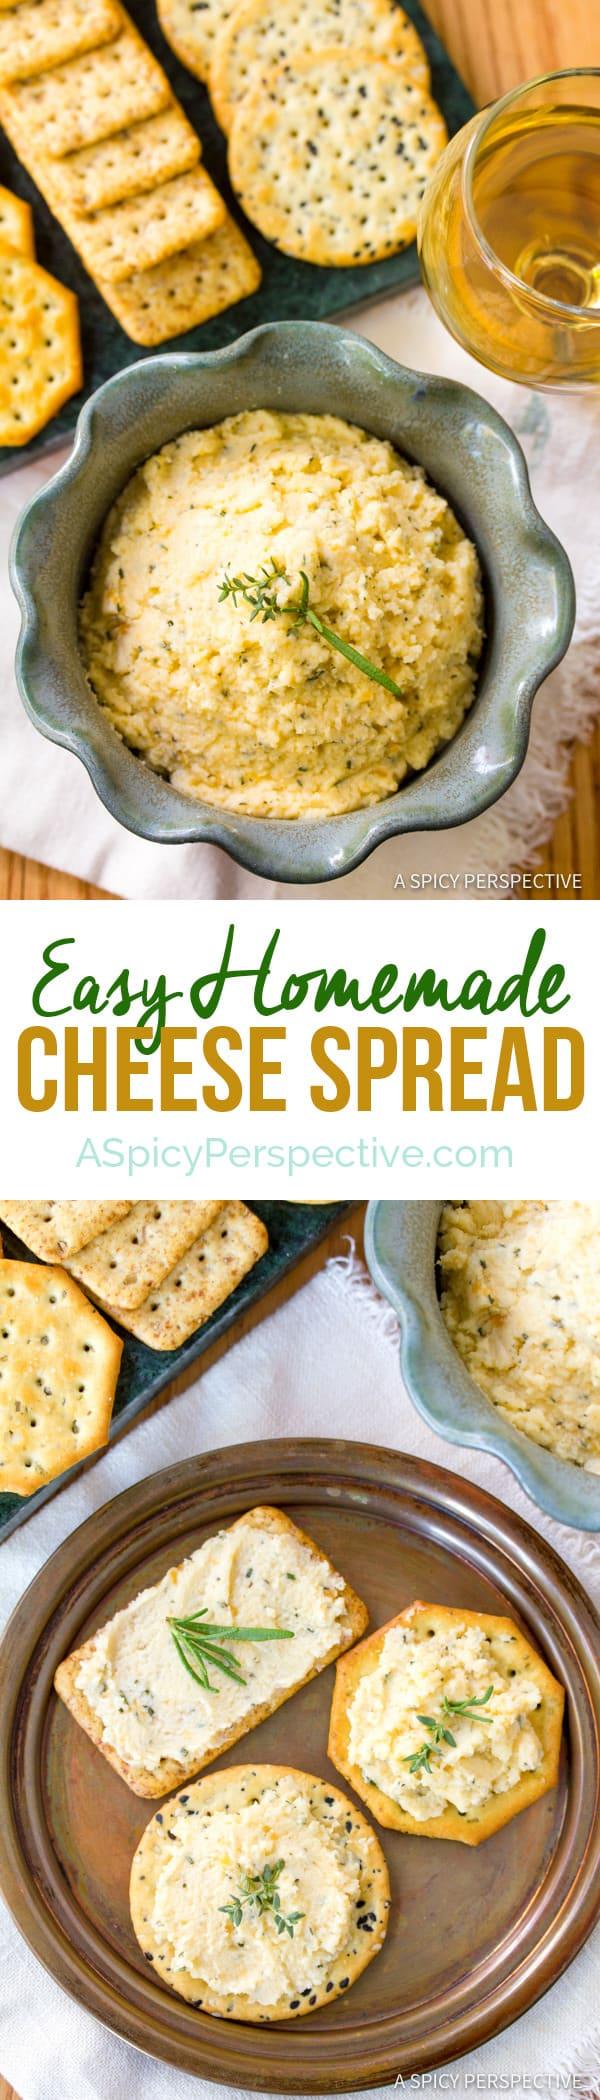 Easy Homemade Cheese Spread | ASpicyPerspective.com